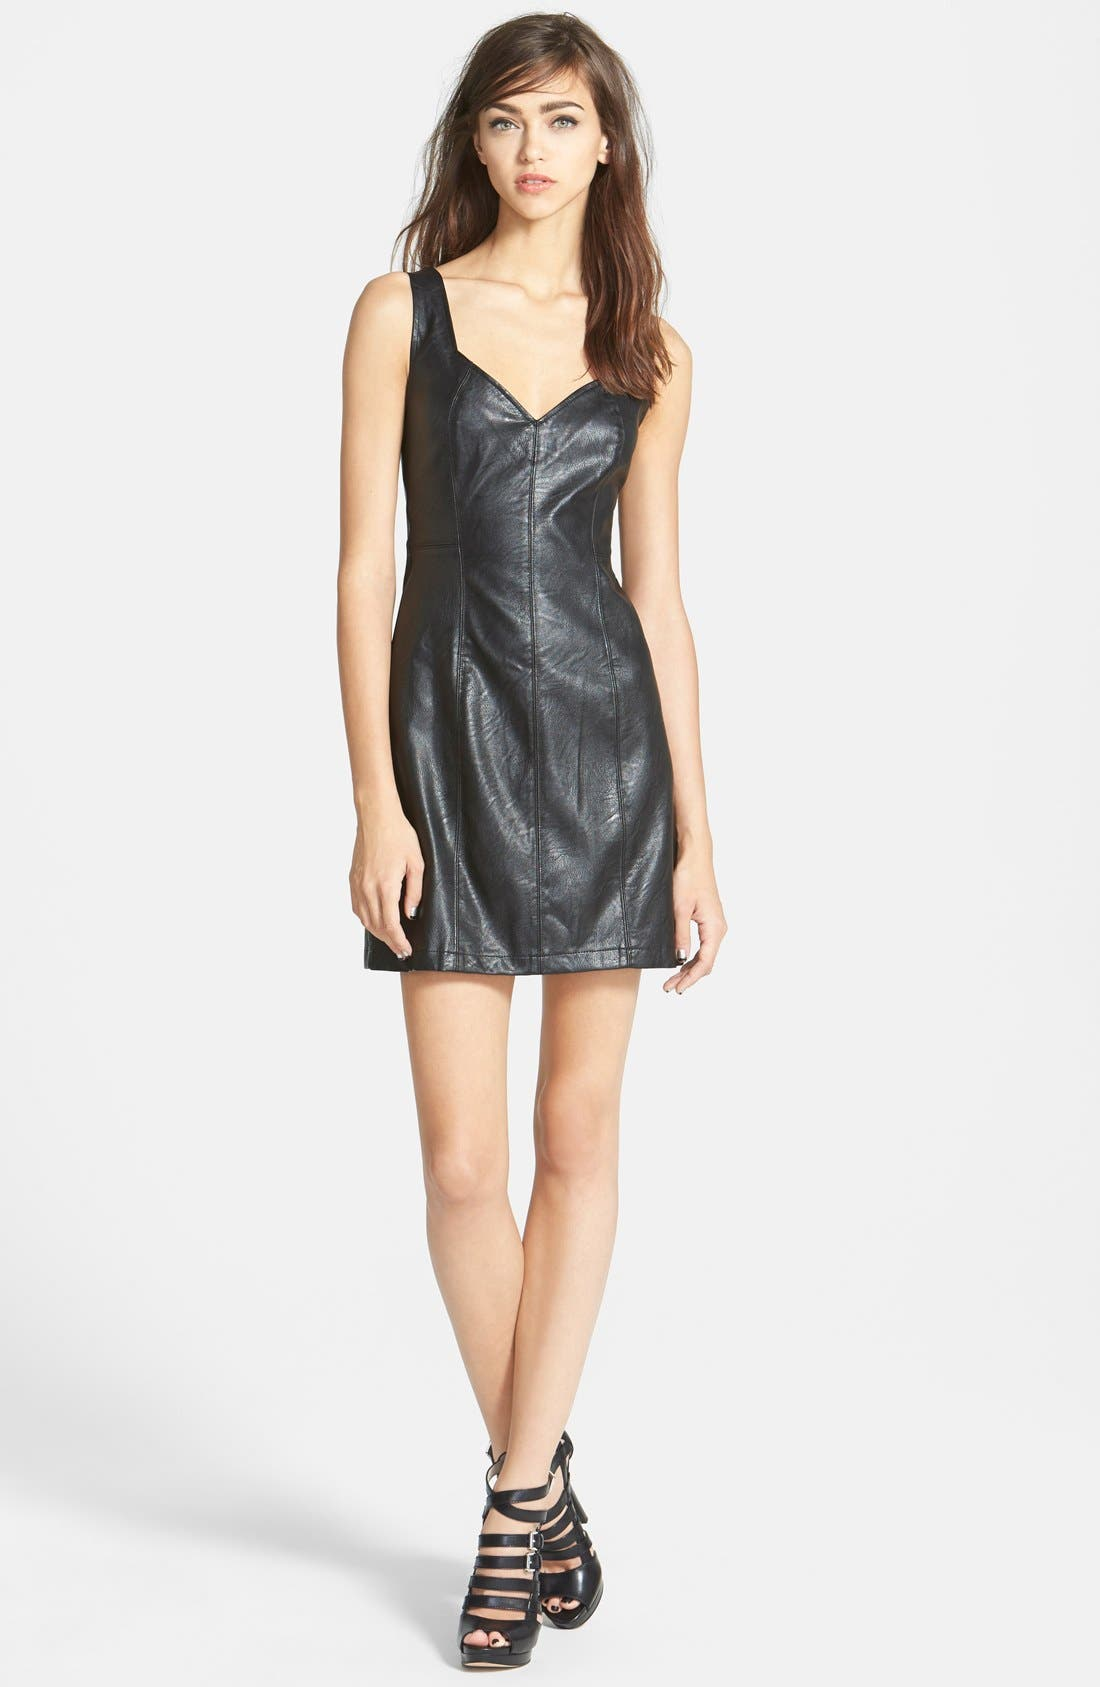 MINKPINK 'Pearl of a Girl' Sheath Dress, Main, color, 001